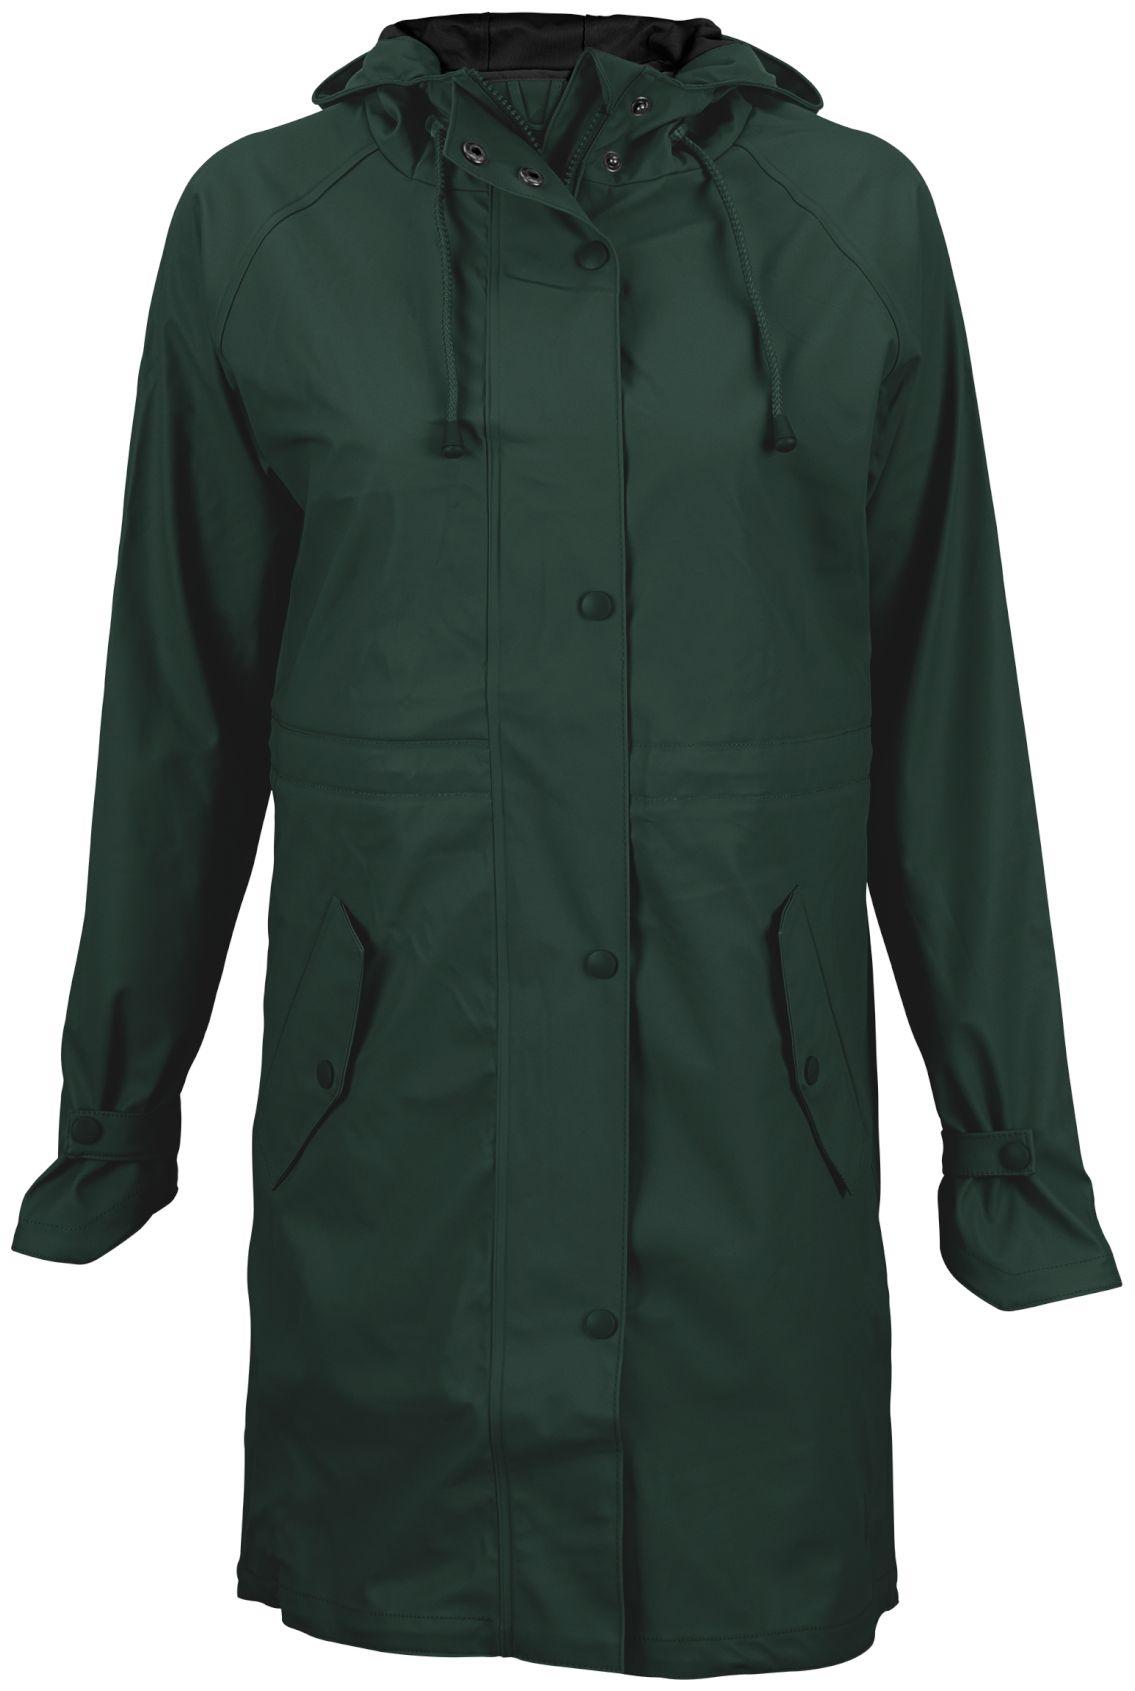 Palton de ploaie Femei • Mizzle •